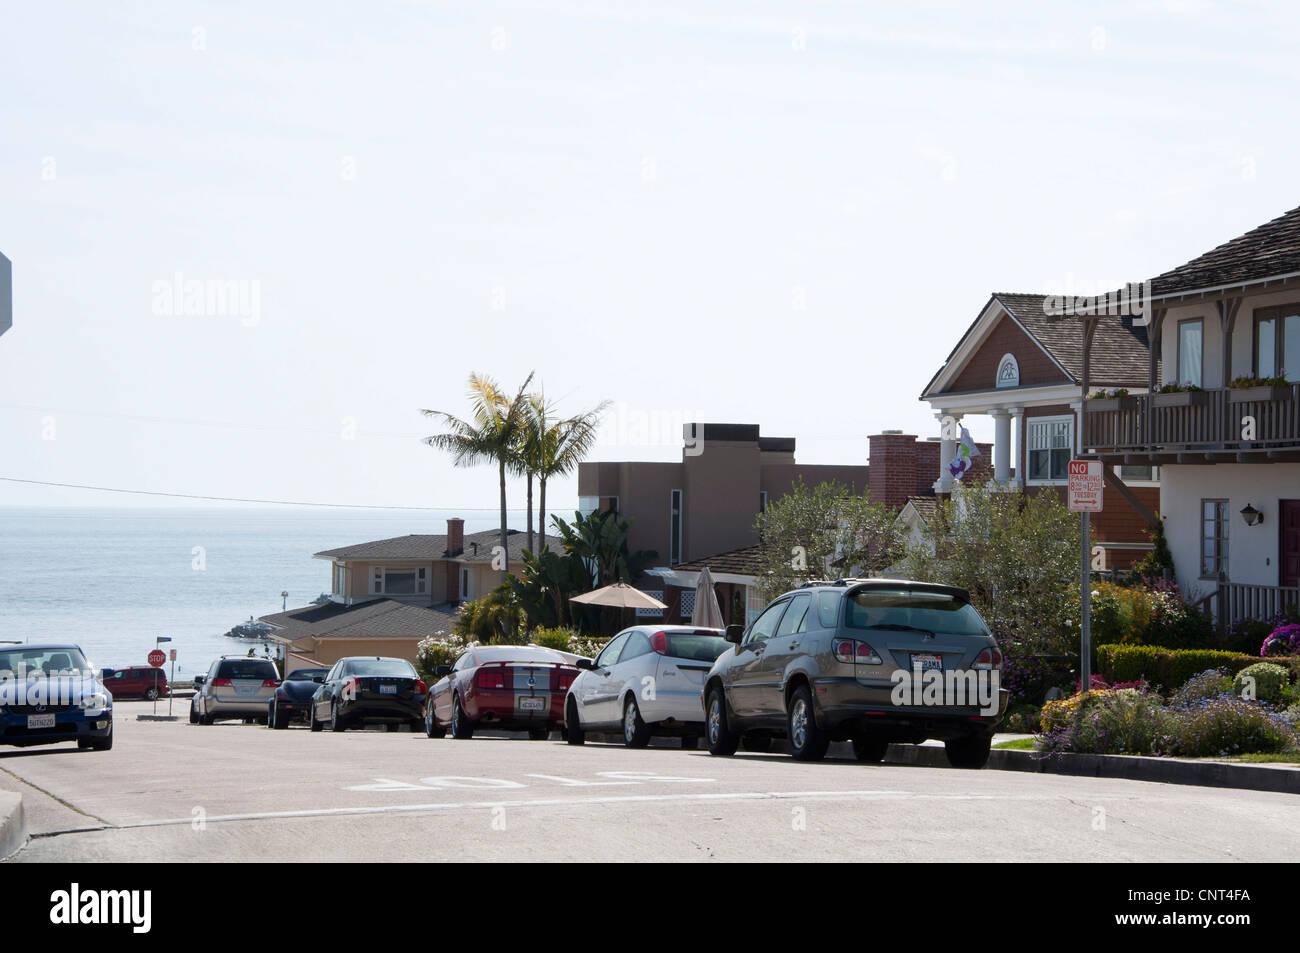 California street view on the beach - Stock Image